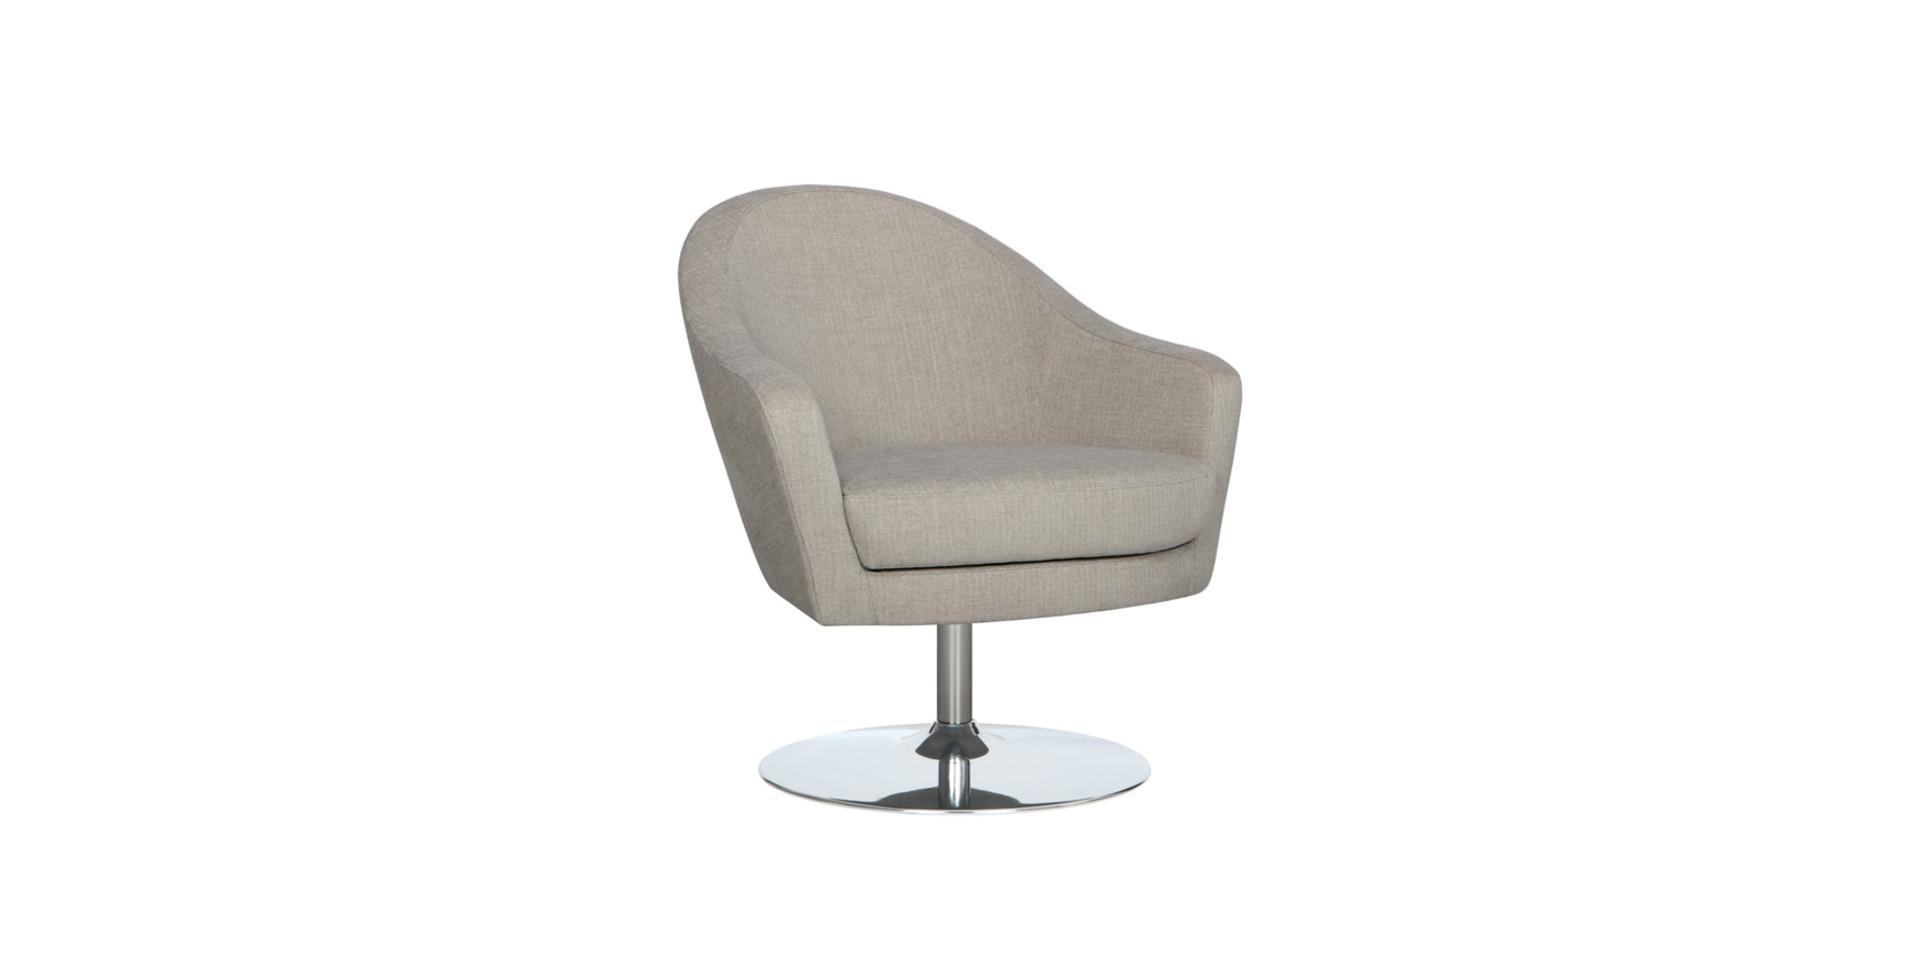 SHELL_armchair_swivel_flossy6_light_grey_2